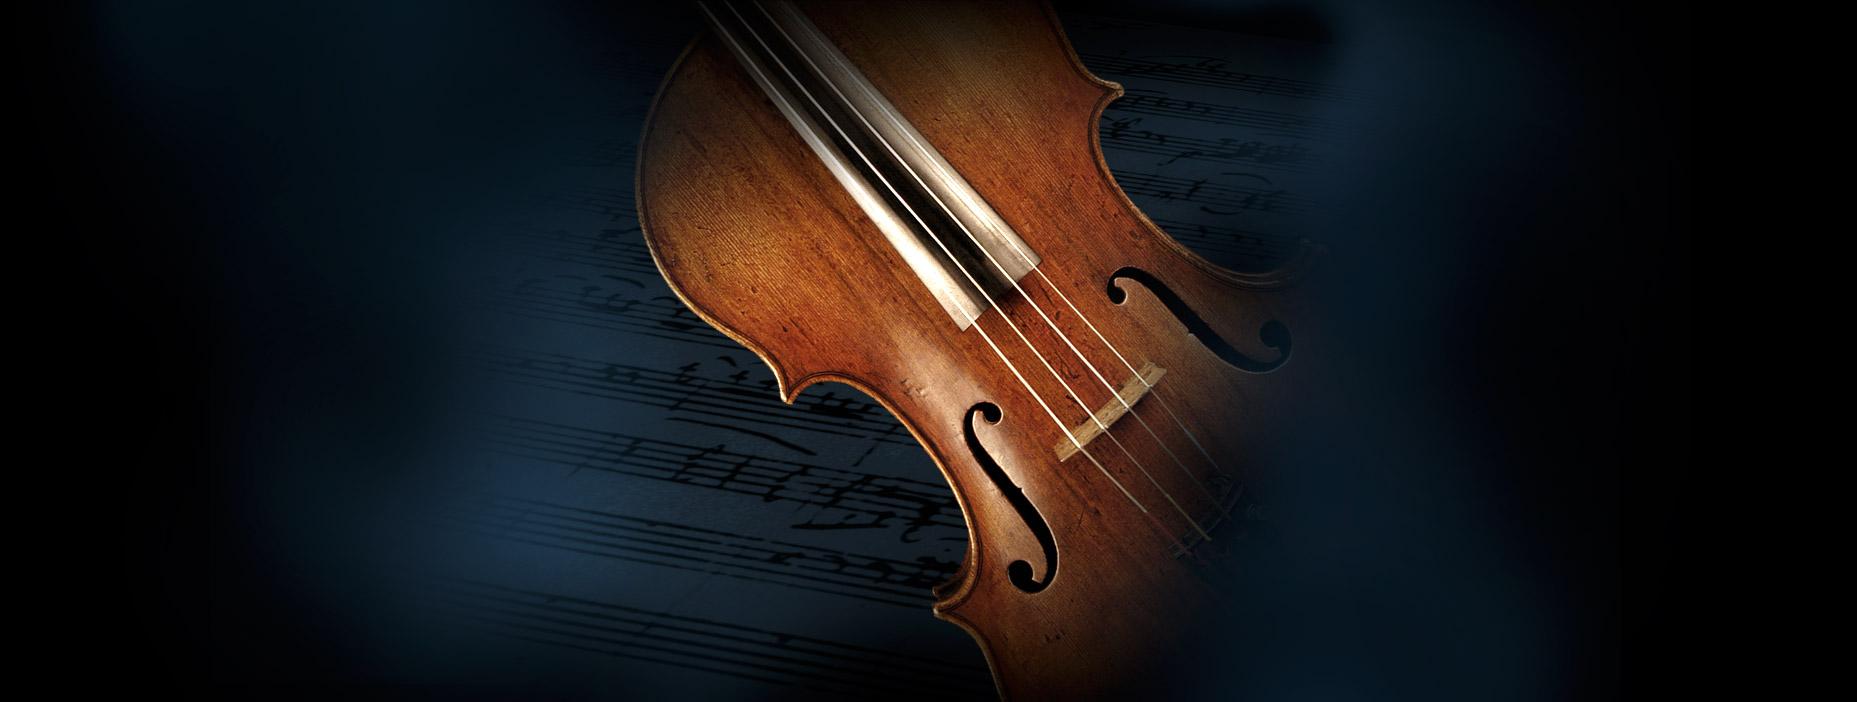 Empresa de Eventos Musicais Para Casamentos, Orquestra e Coral, Corporativo